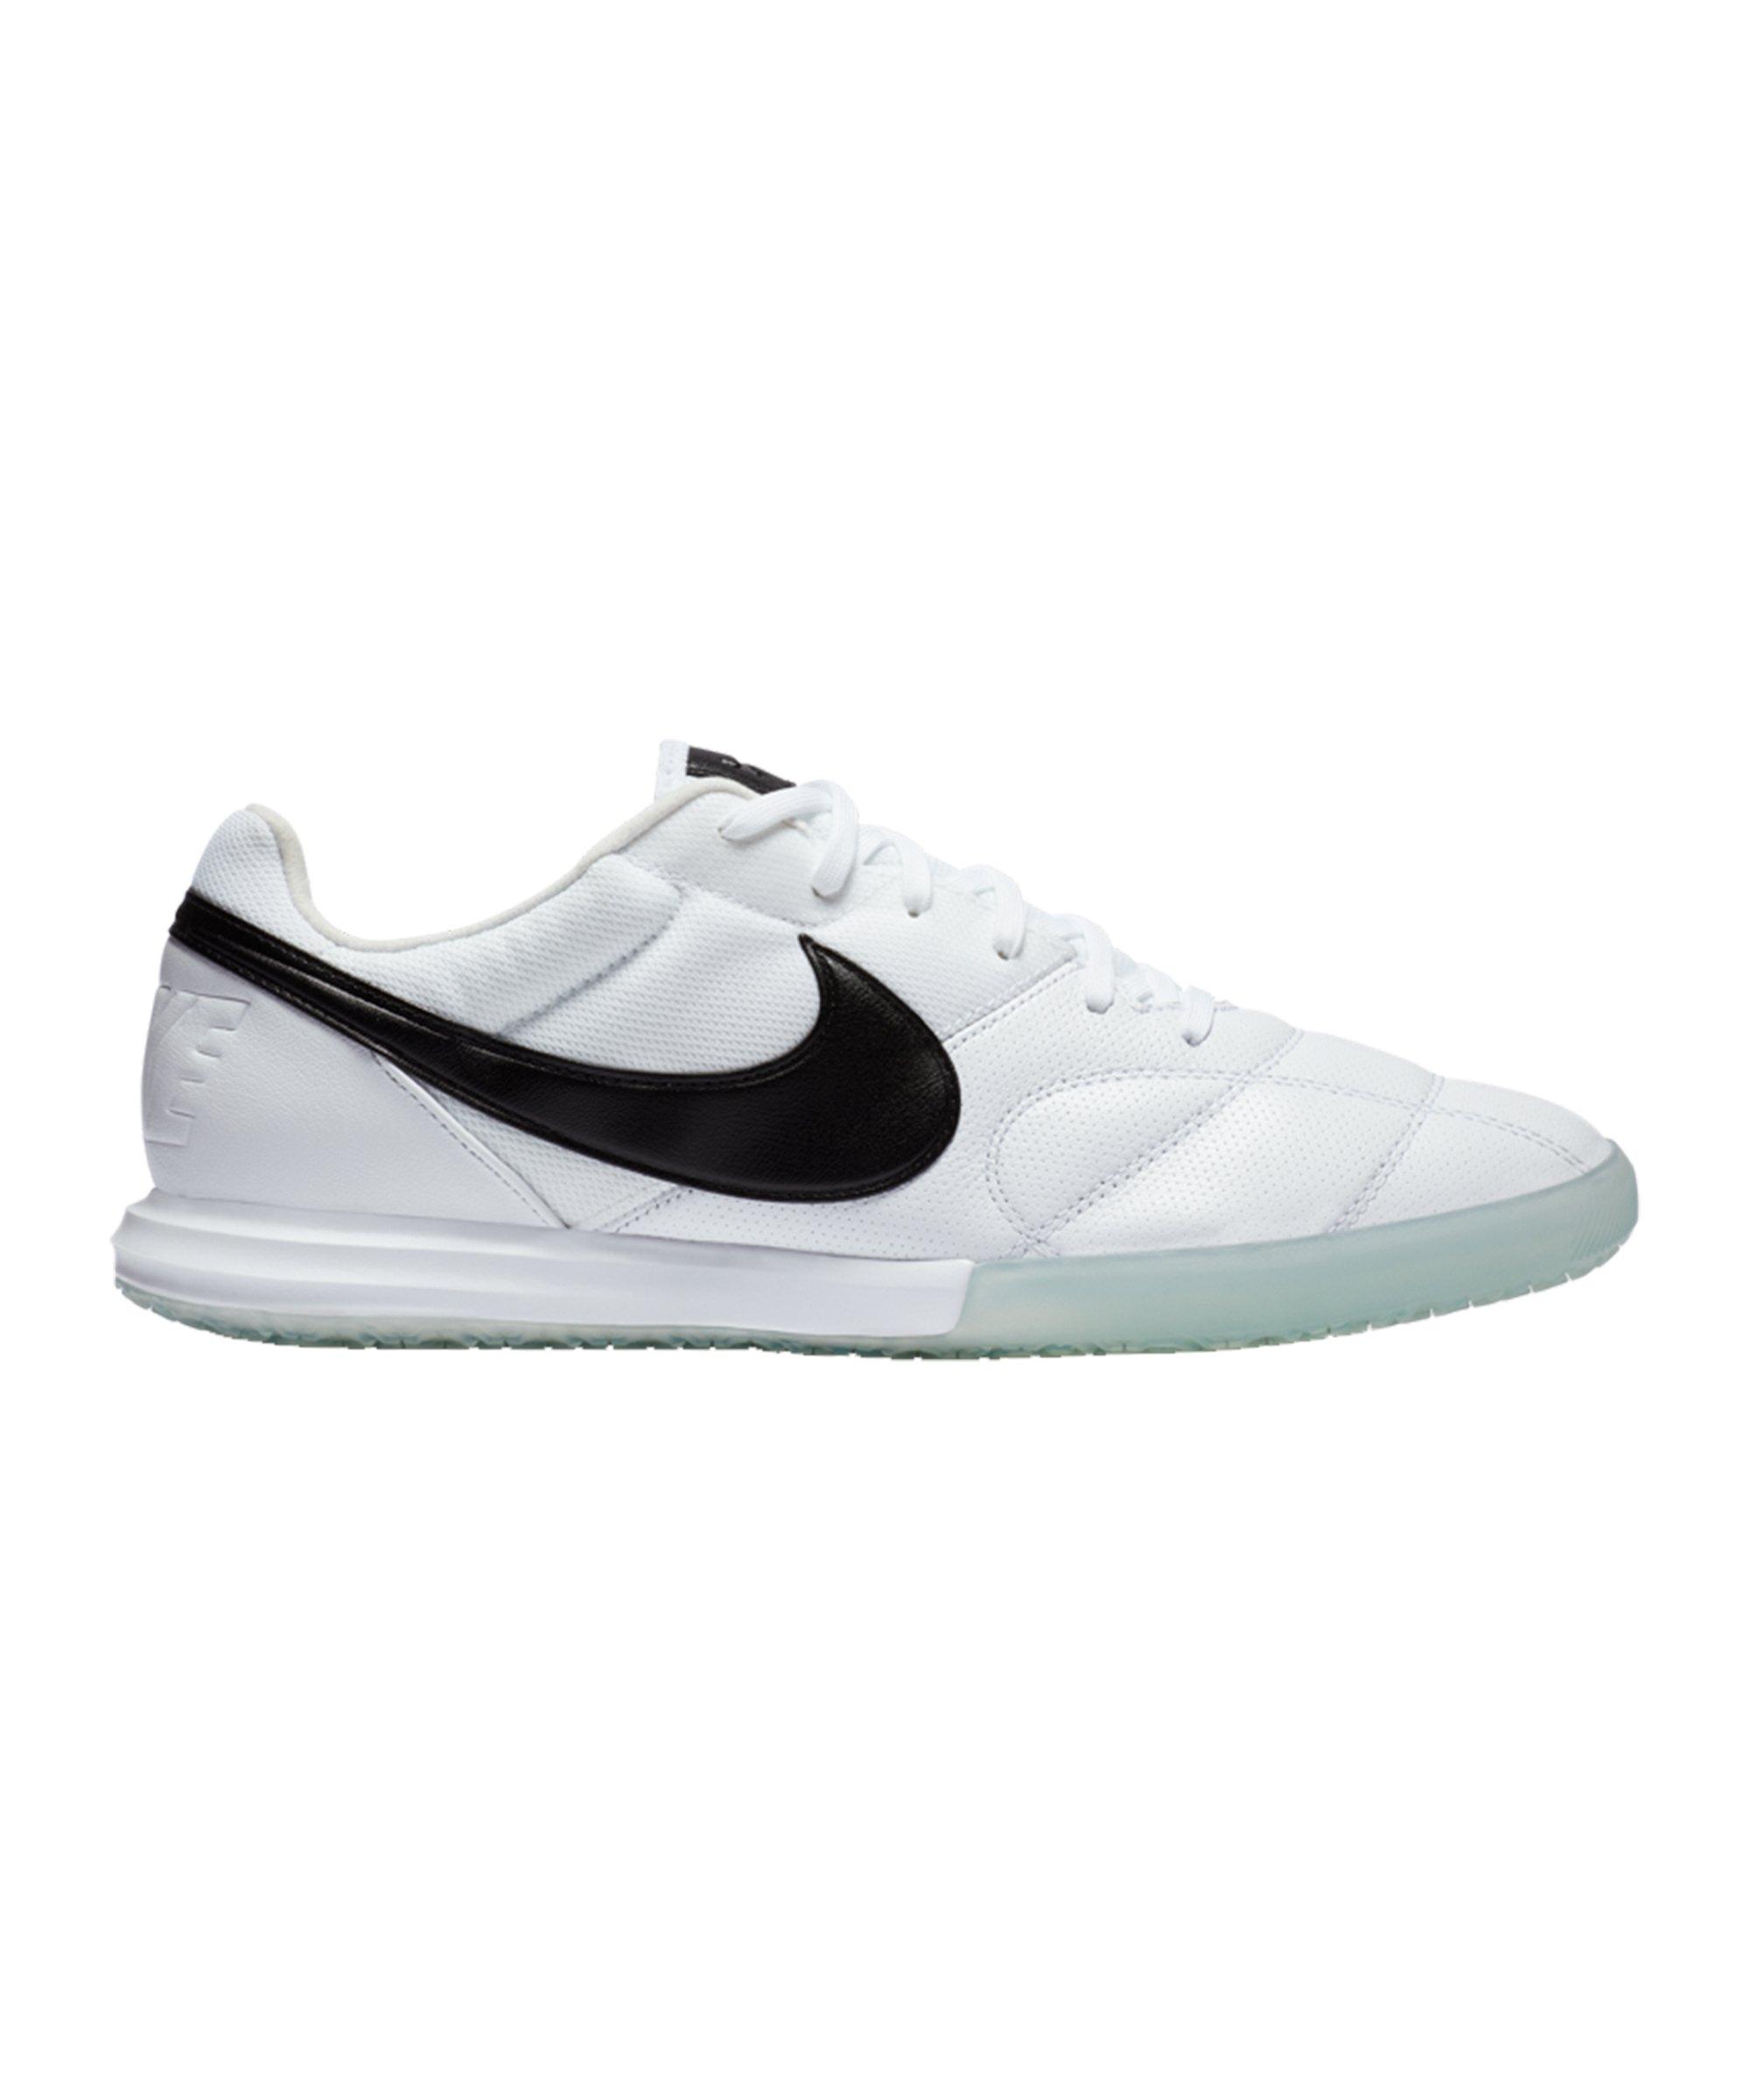 Nike Premier II Sala IC Weiss F101 - weiss